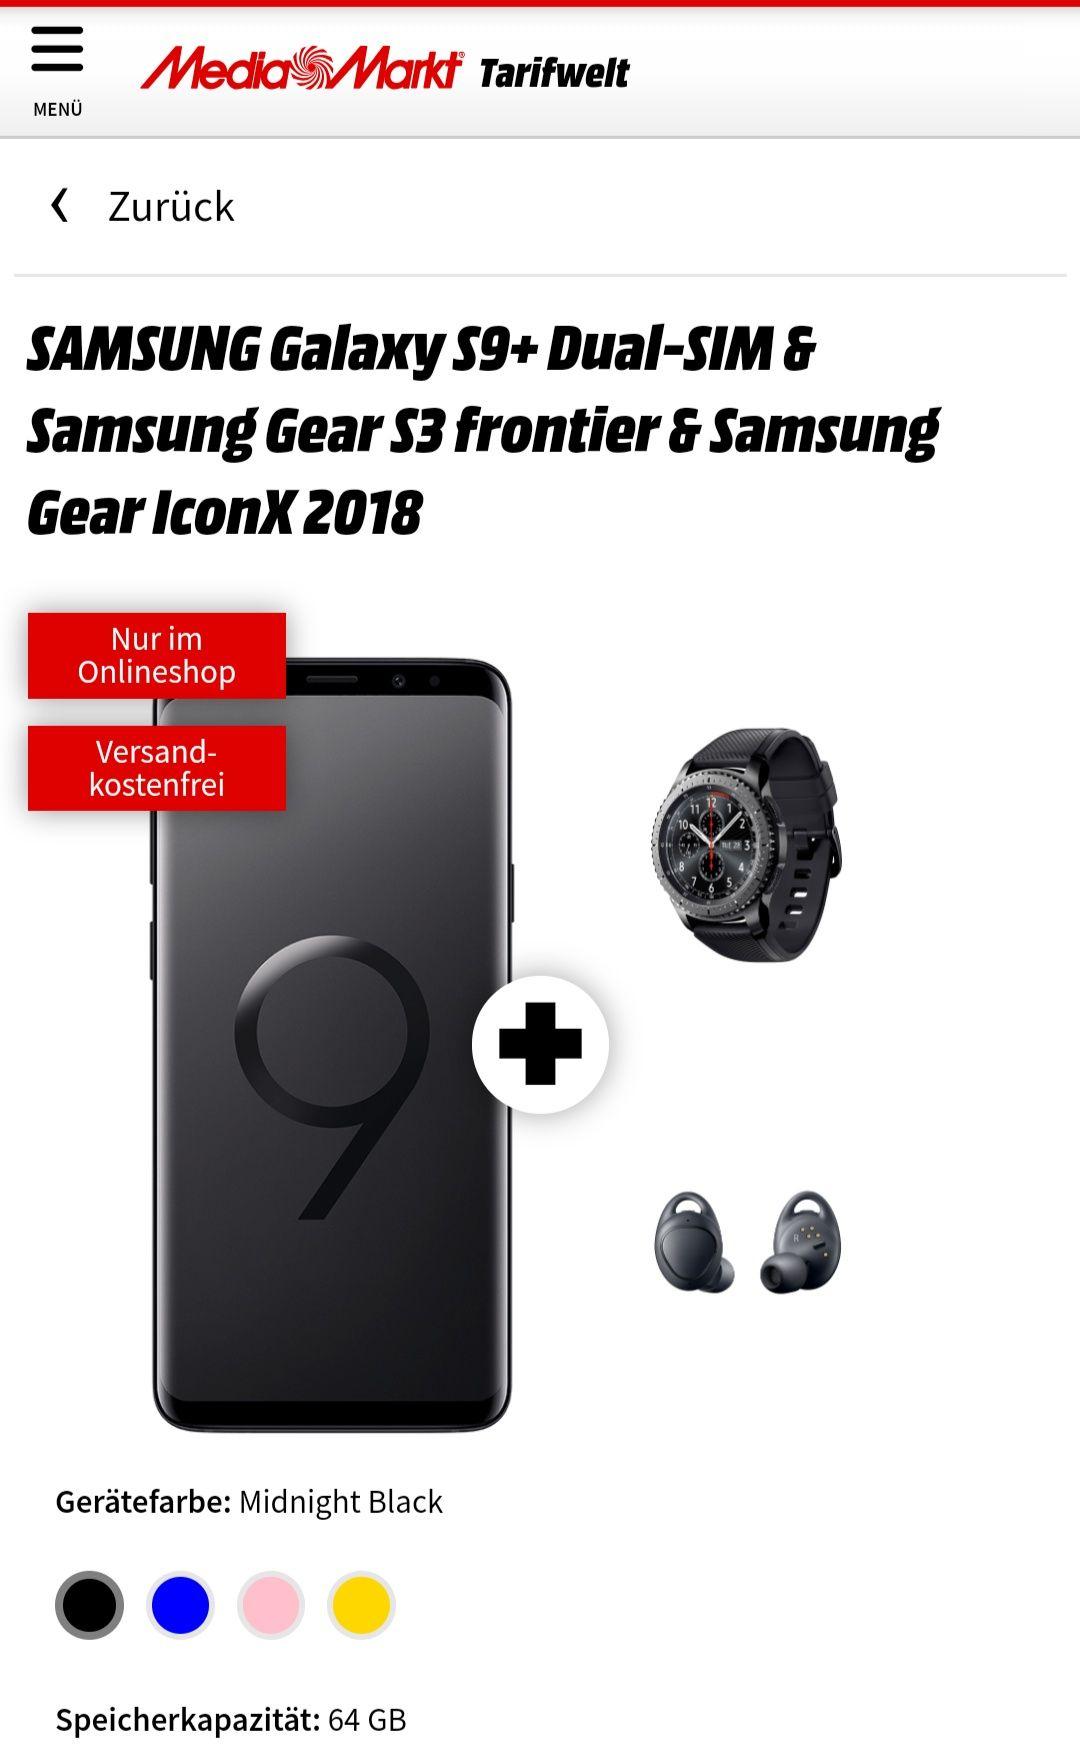 Mediamarkt MD Vodafone Green LTE 4gb inkl SAMSUNGGalaxy S9+ Dual-SIM & Samsung Gear S3 frontier & Samsung Gear IconX 2018